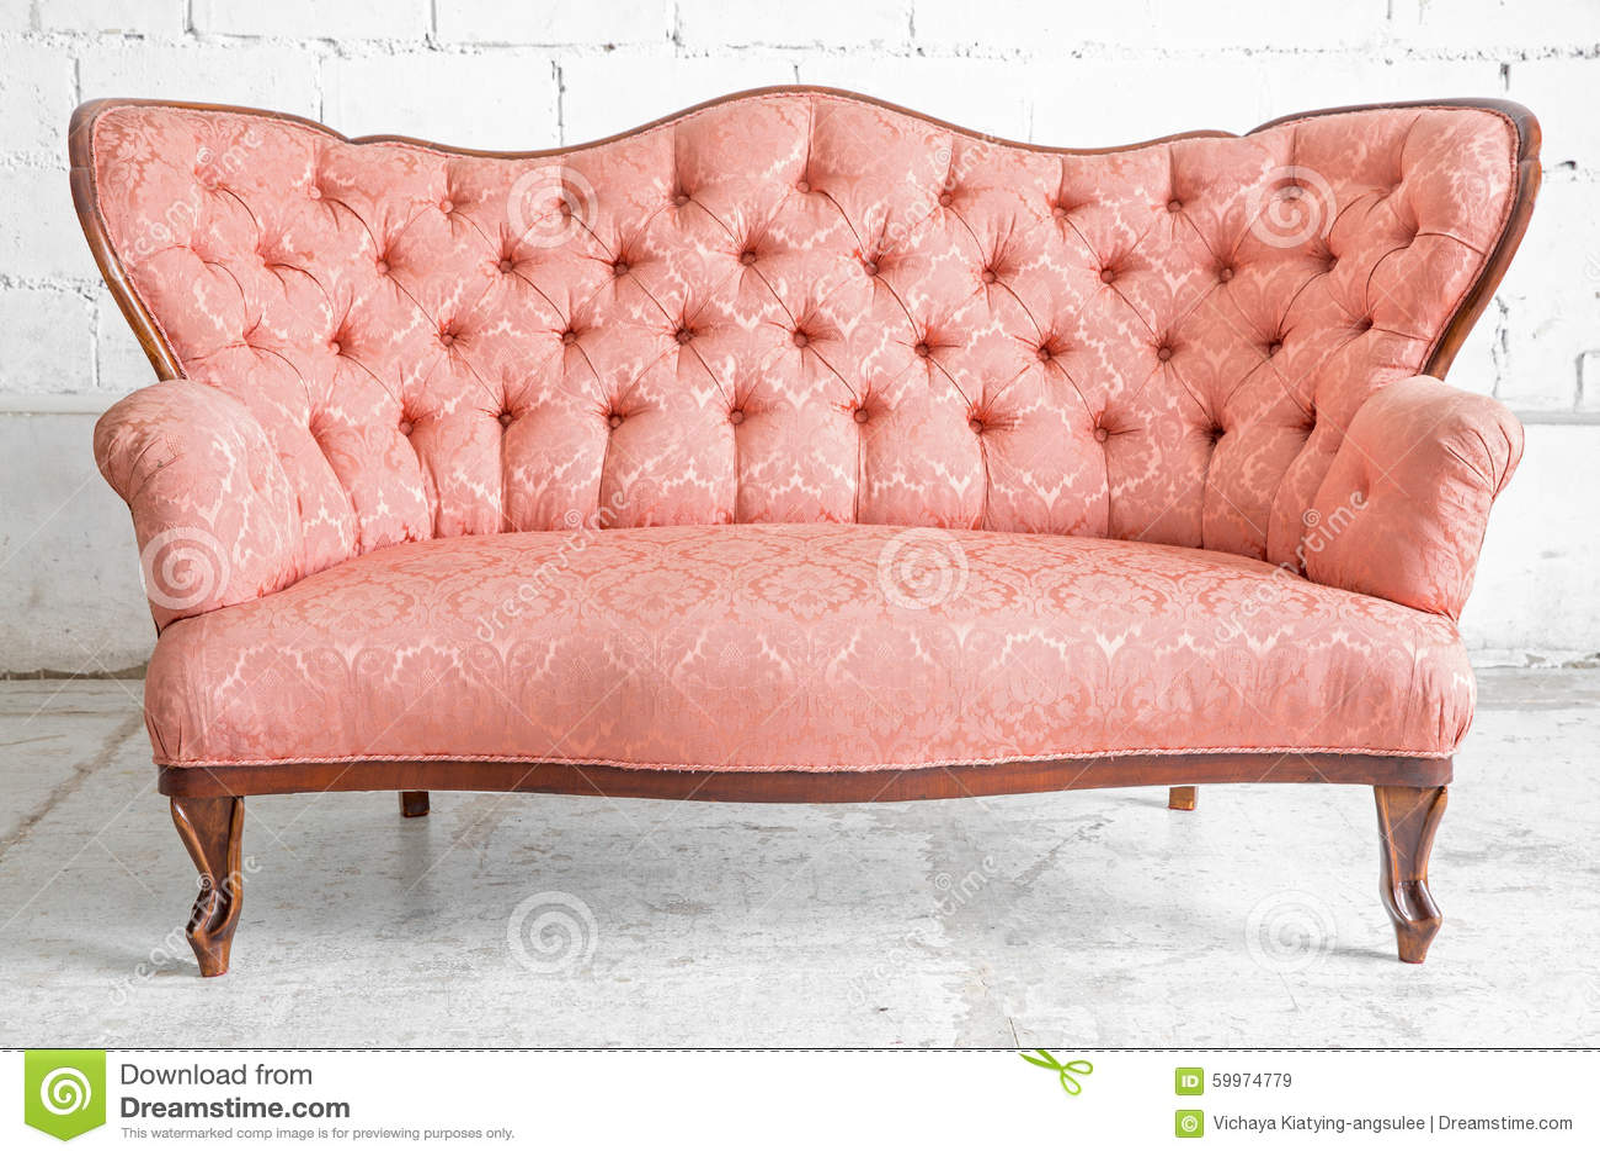 Vintage Pink Sofa